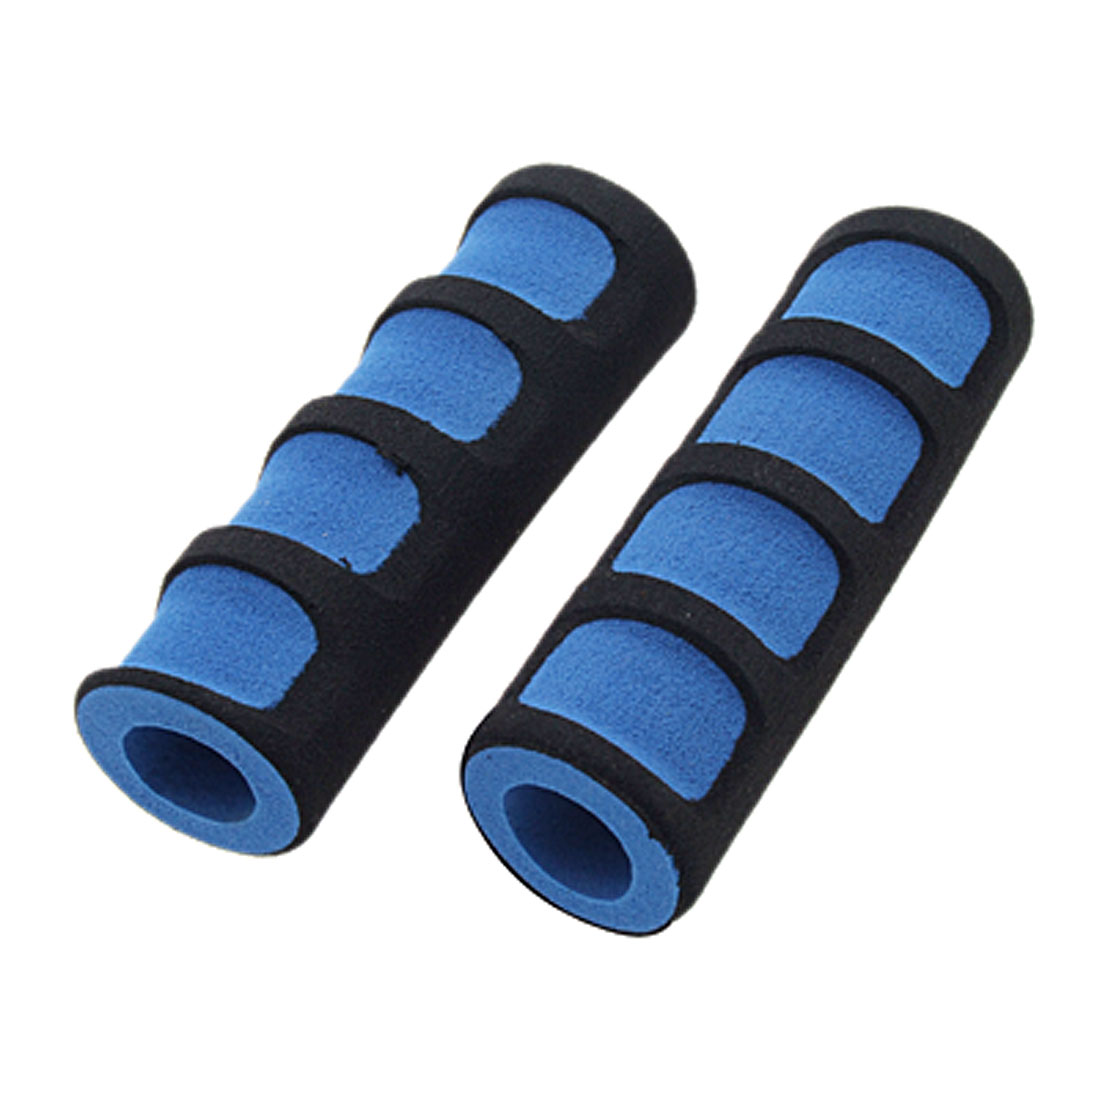 2PCS Foam Road Bike Bicycle Handle Bar Grips Black and Blue